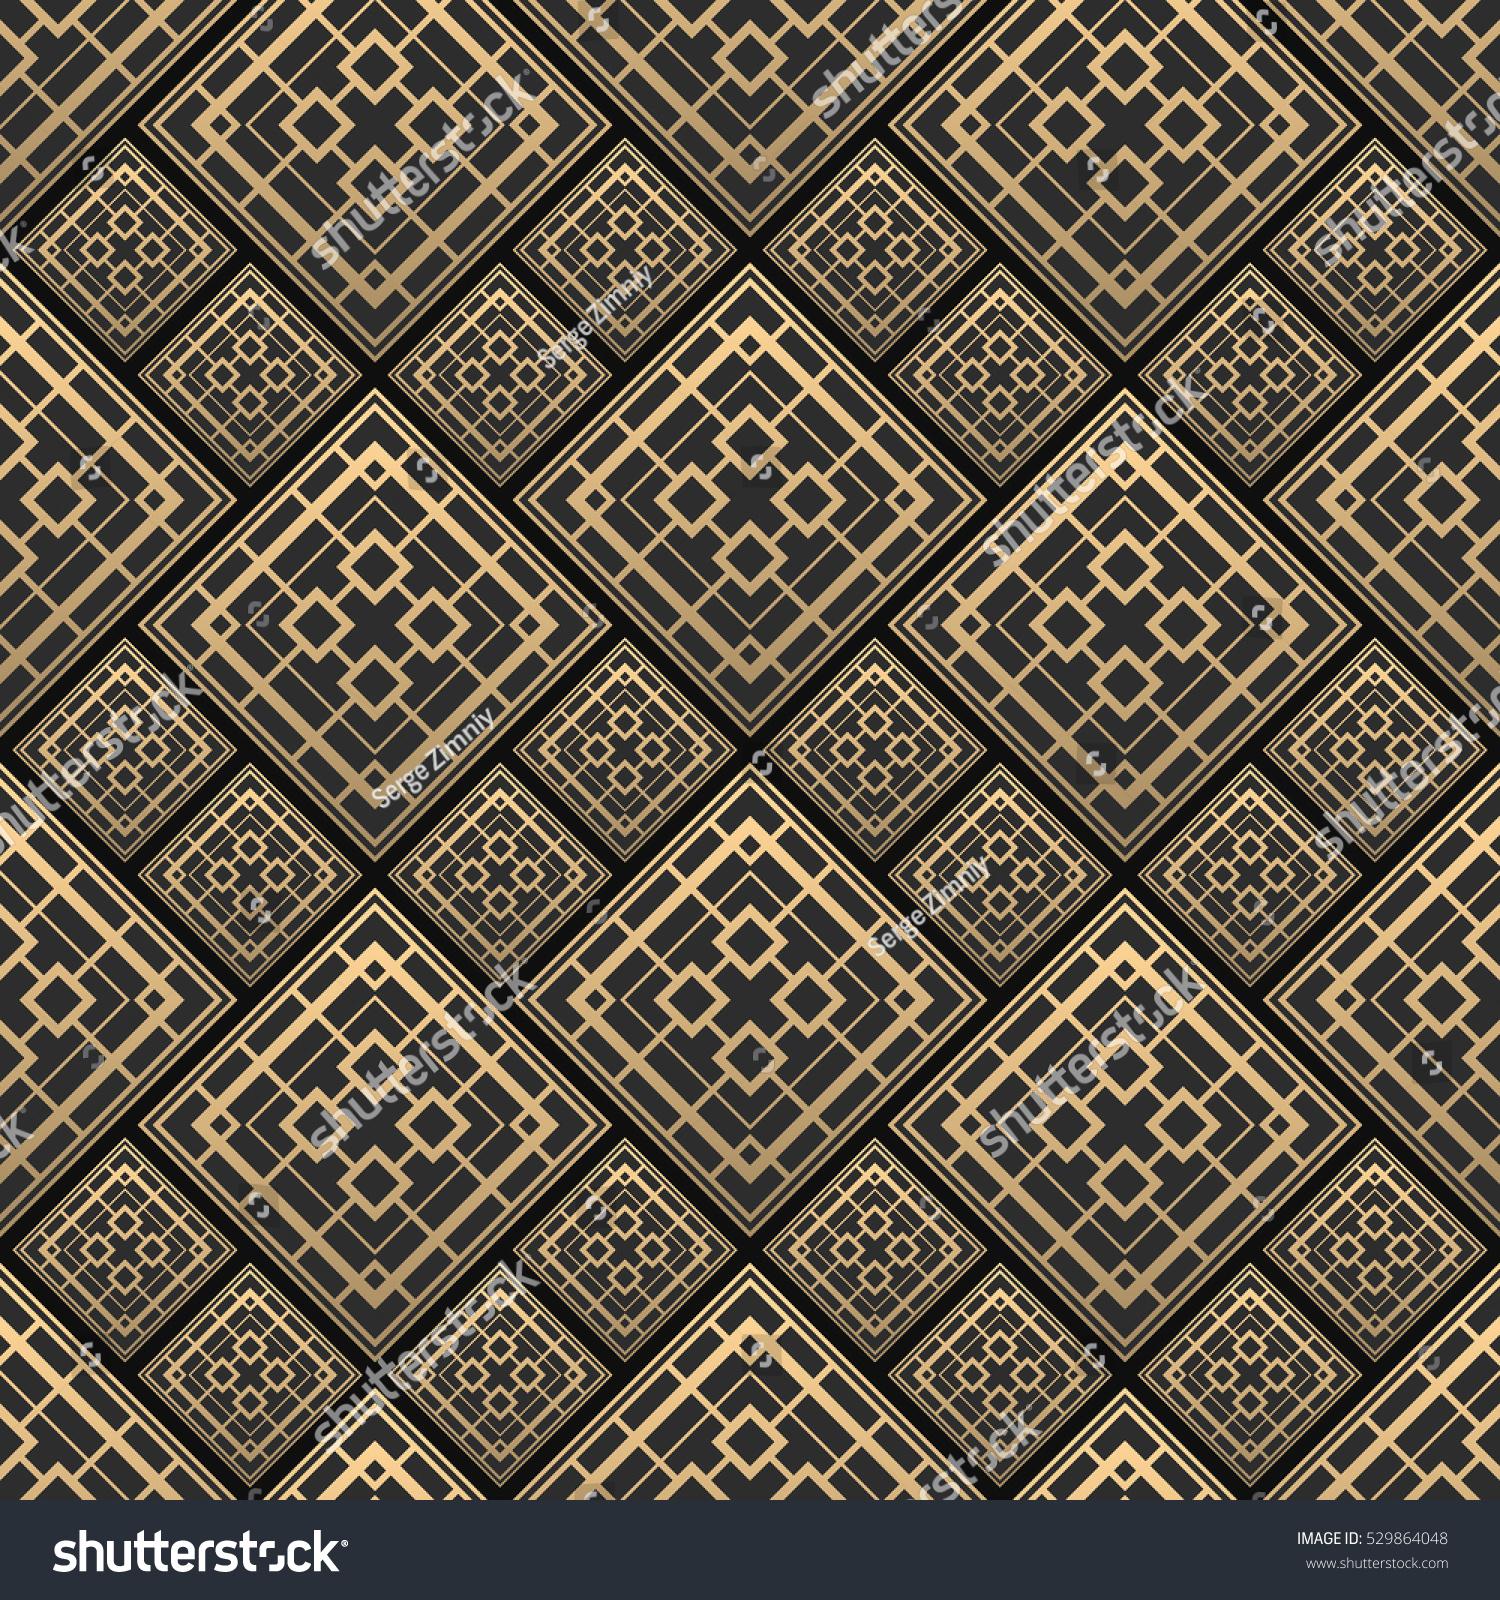 Art deco ceramic tiles images tile flooring design ideas seamless pattern art deco style black stock vector 529864048 seamless pattern in art deco style black dailygadgetfo Images